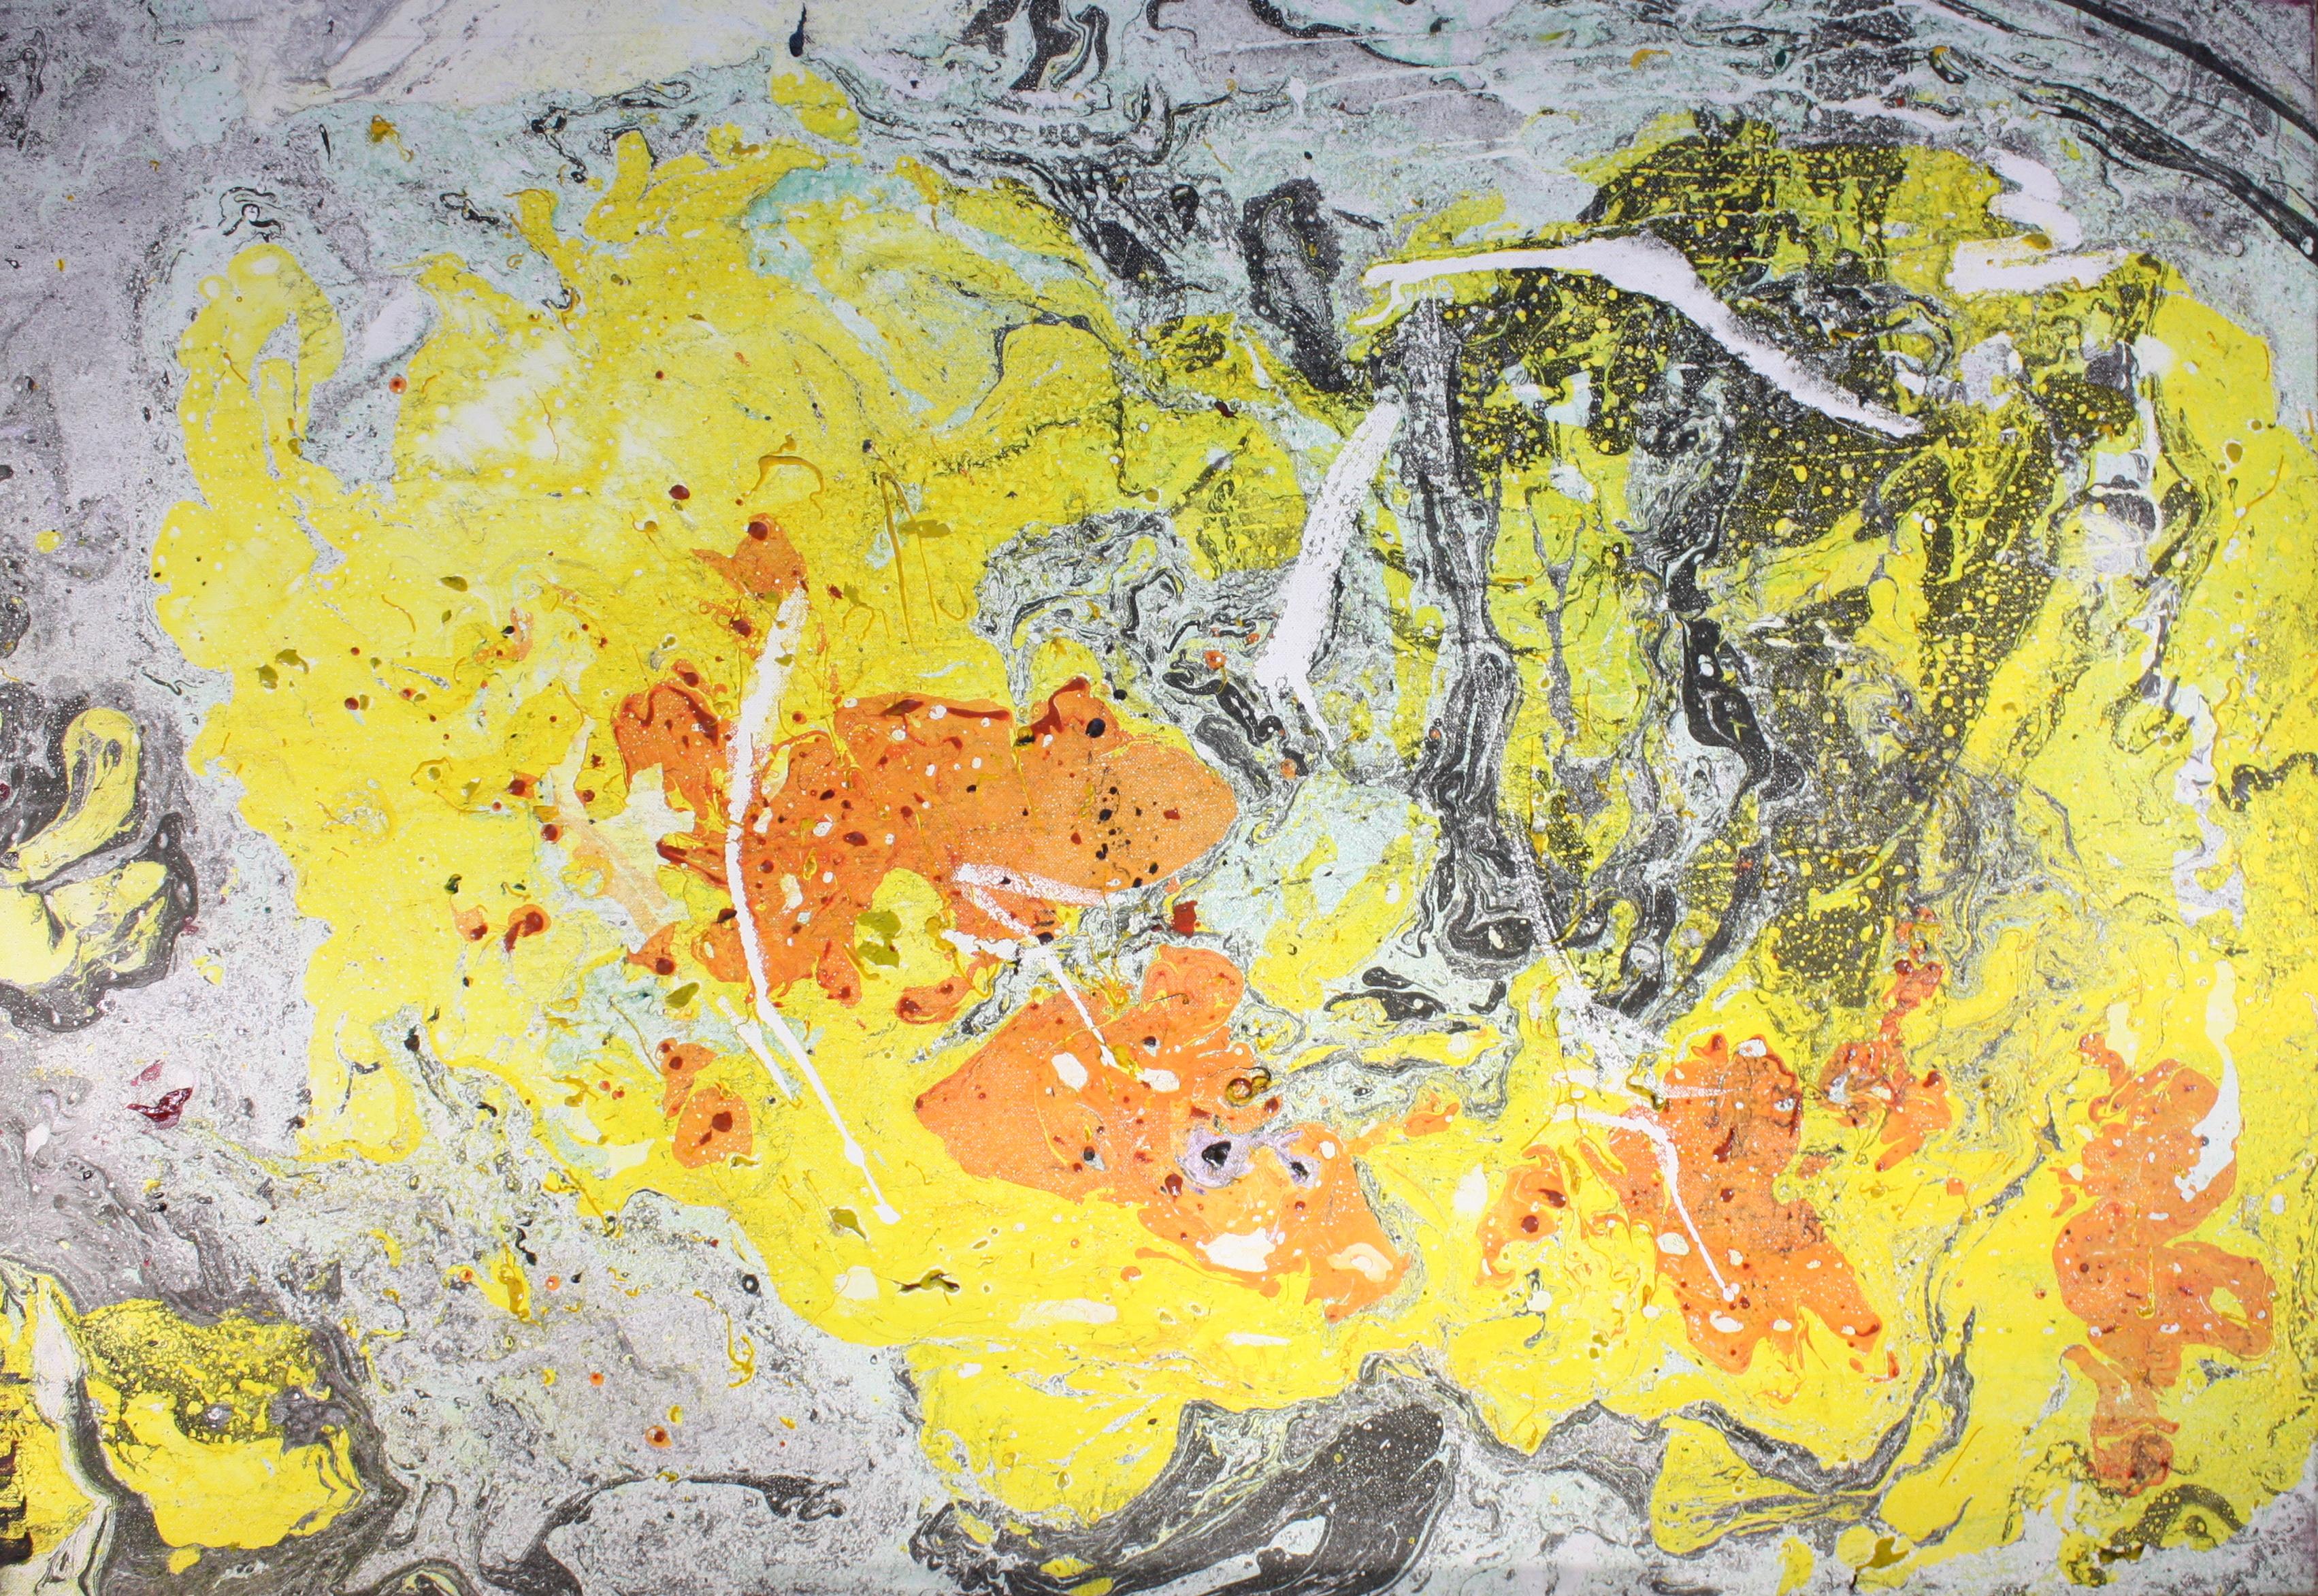 49 painting 70x100 (35)